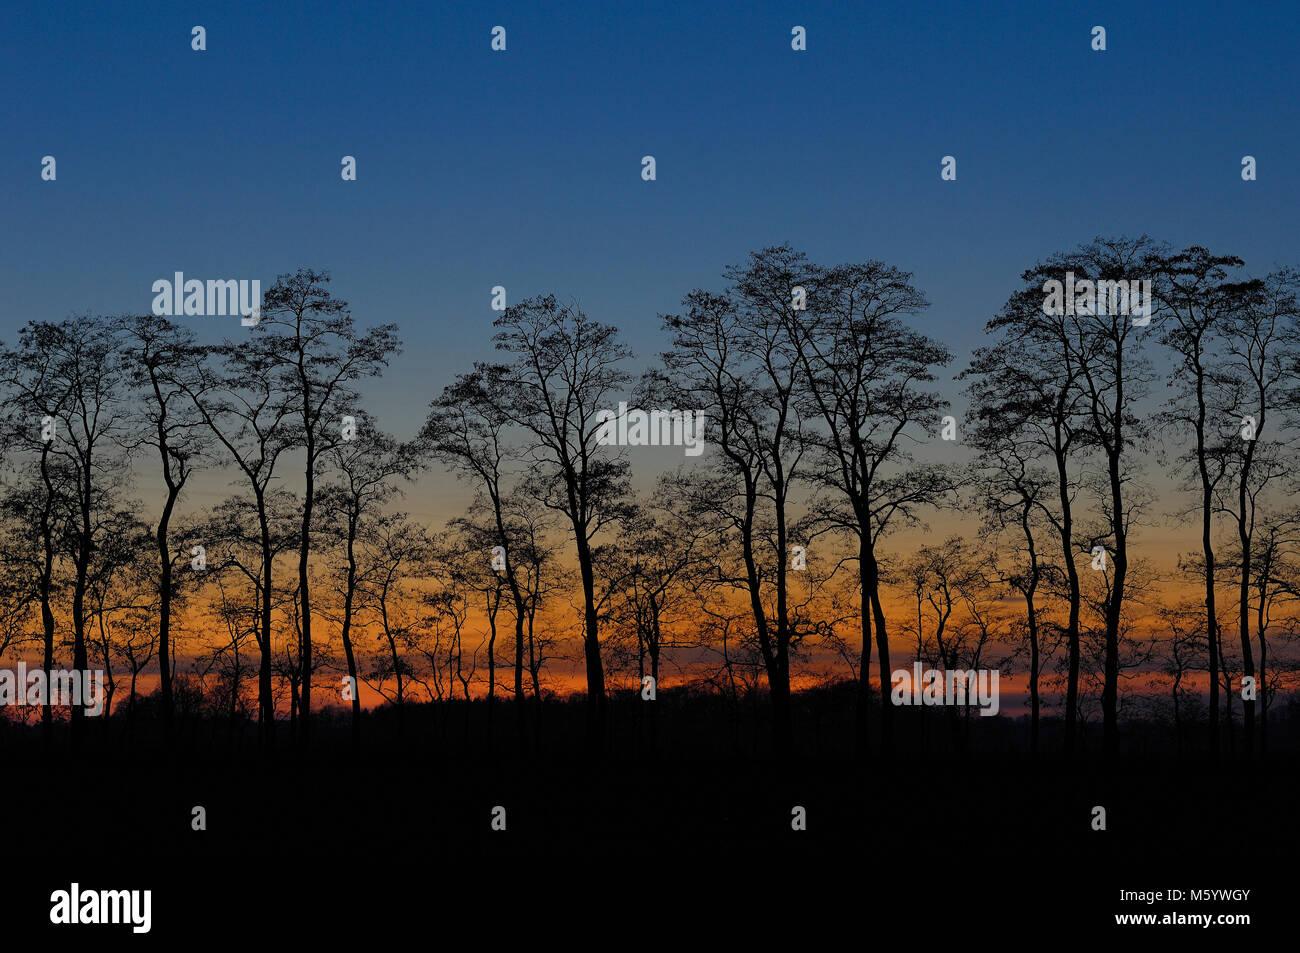 Baumreihe im Sonnenuntergang Stock Photo